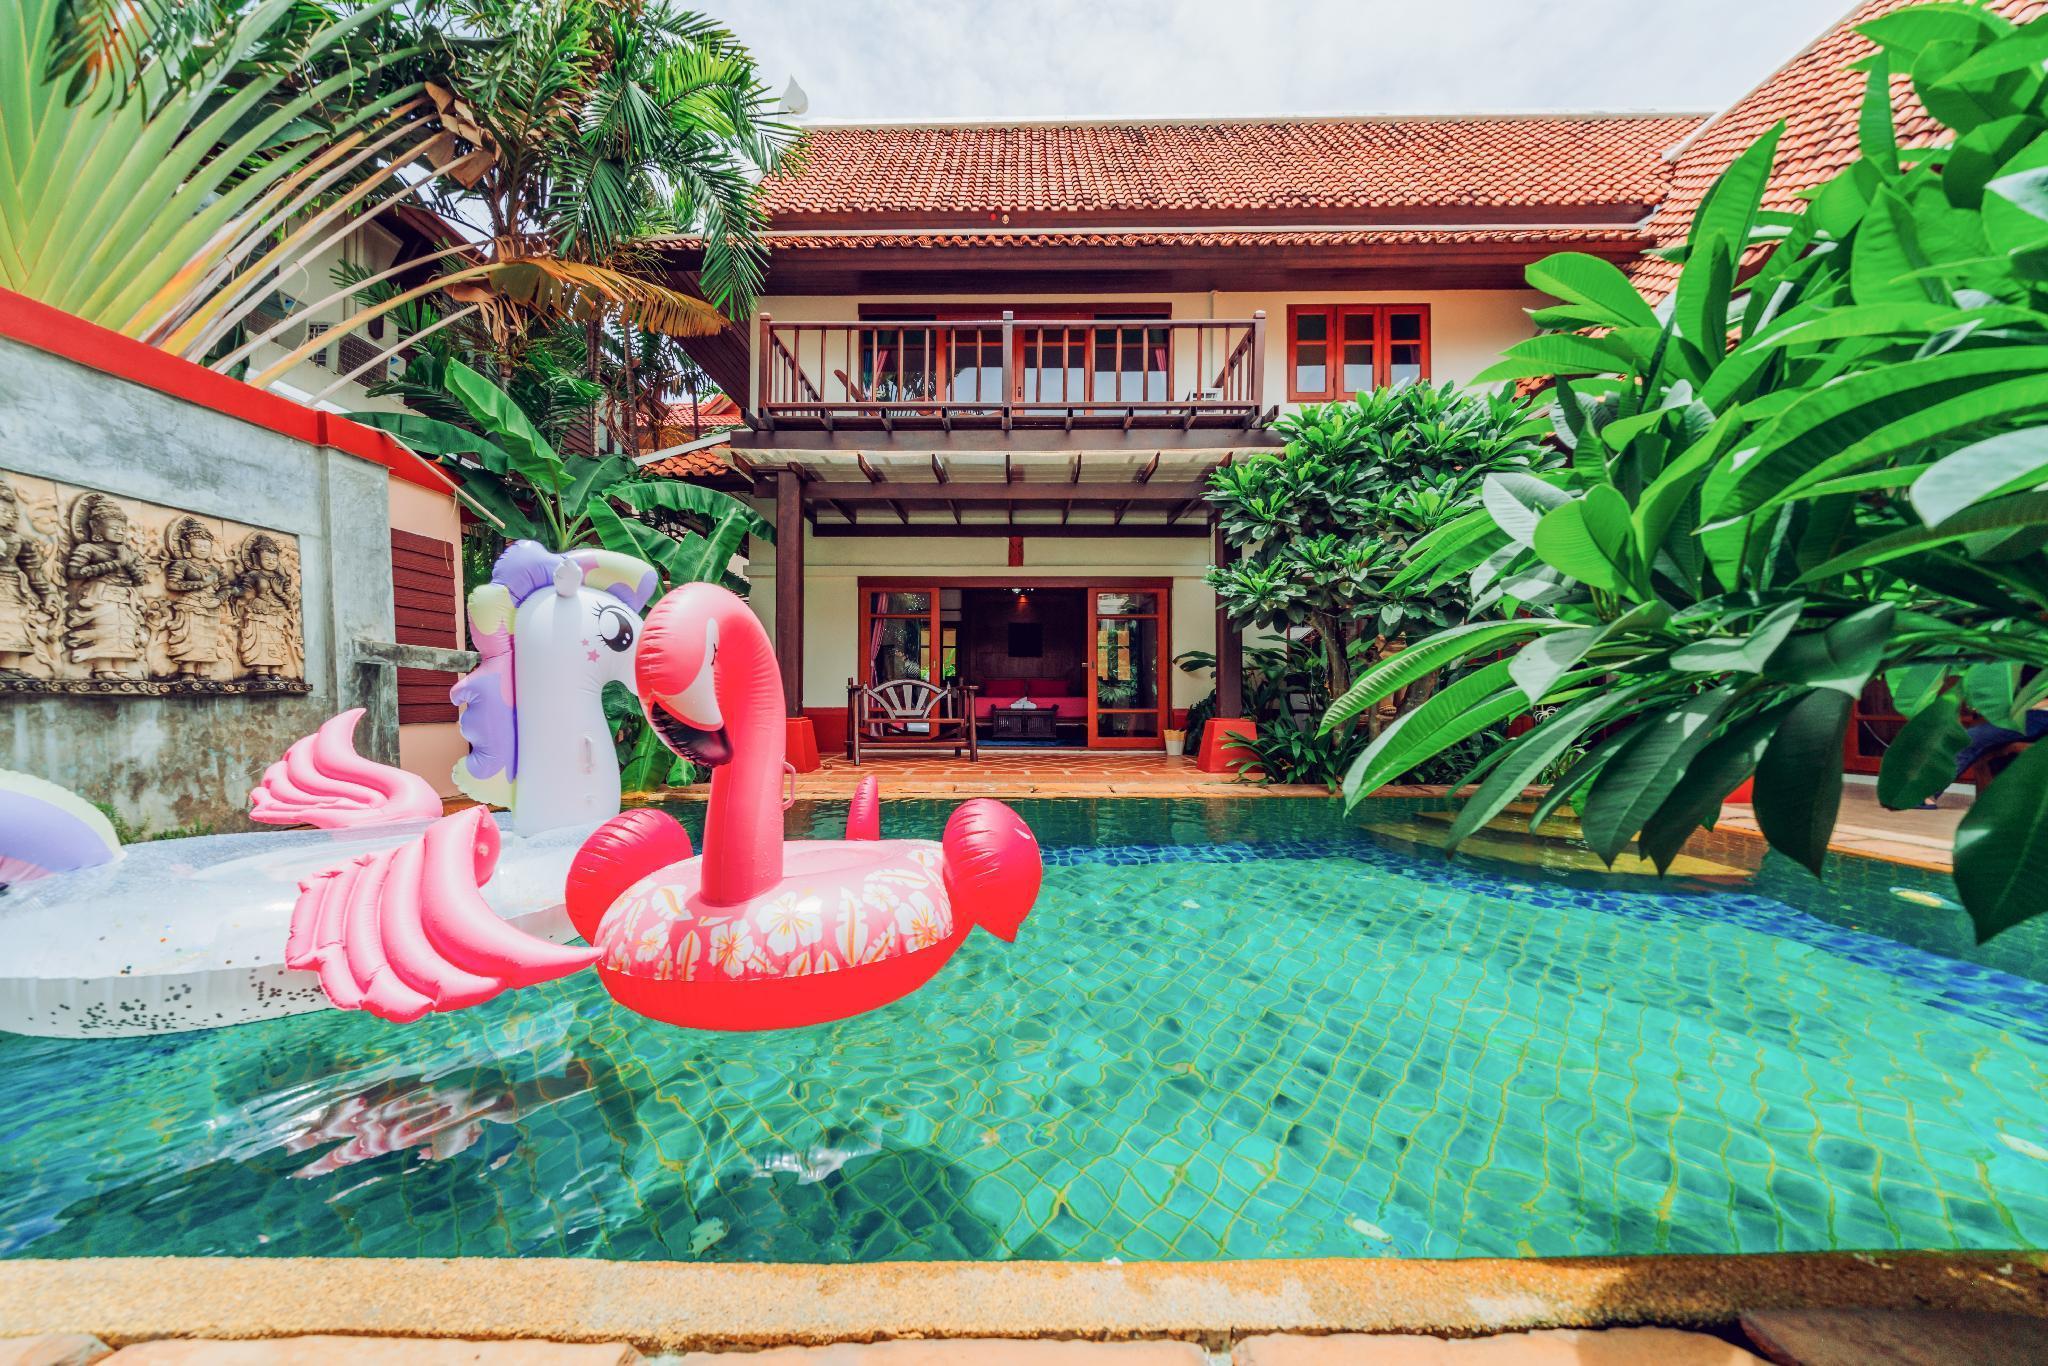 Jomtien Beach Super Deluxe Pool Villa วิลลา 4 ห้องนอน 4 ห้องน้ำส่วนตัว ขนาด 360 ตร.ม. – เขาพระตำหนัก